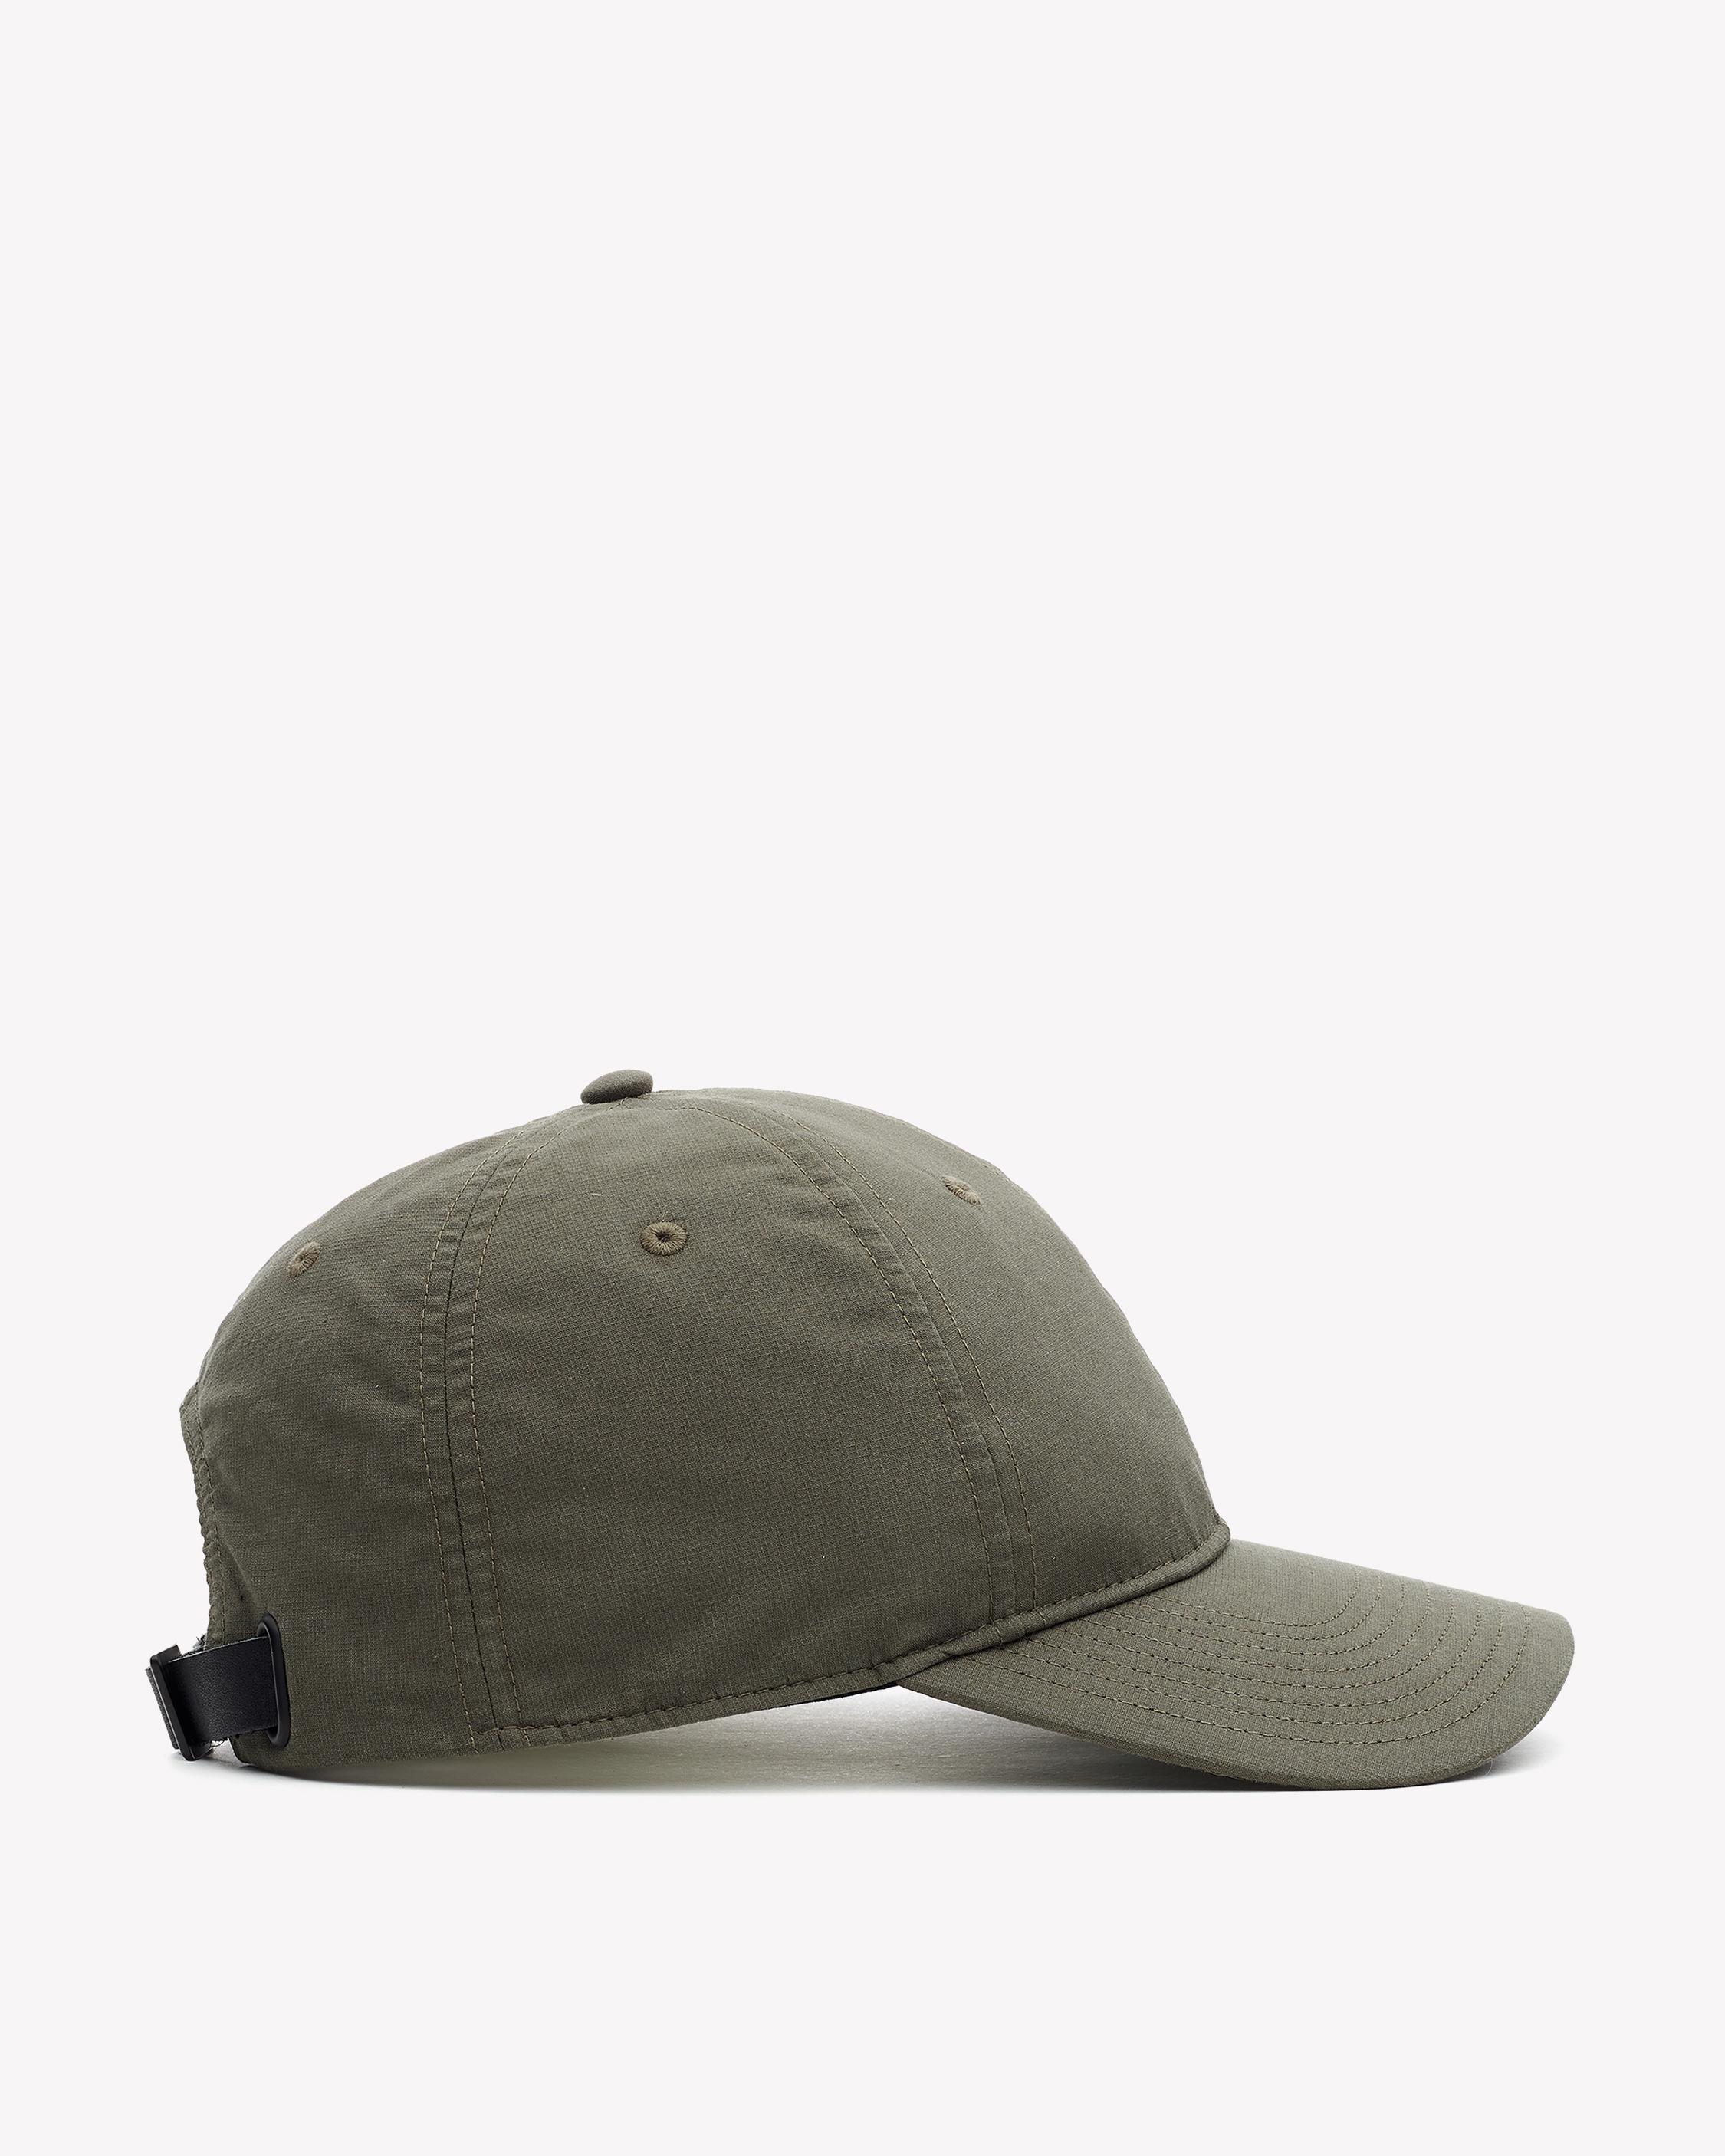 8d2dc9bdd18 Lyst - Rag   Bone Archie Baseball Cap in Green for Men